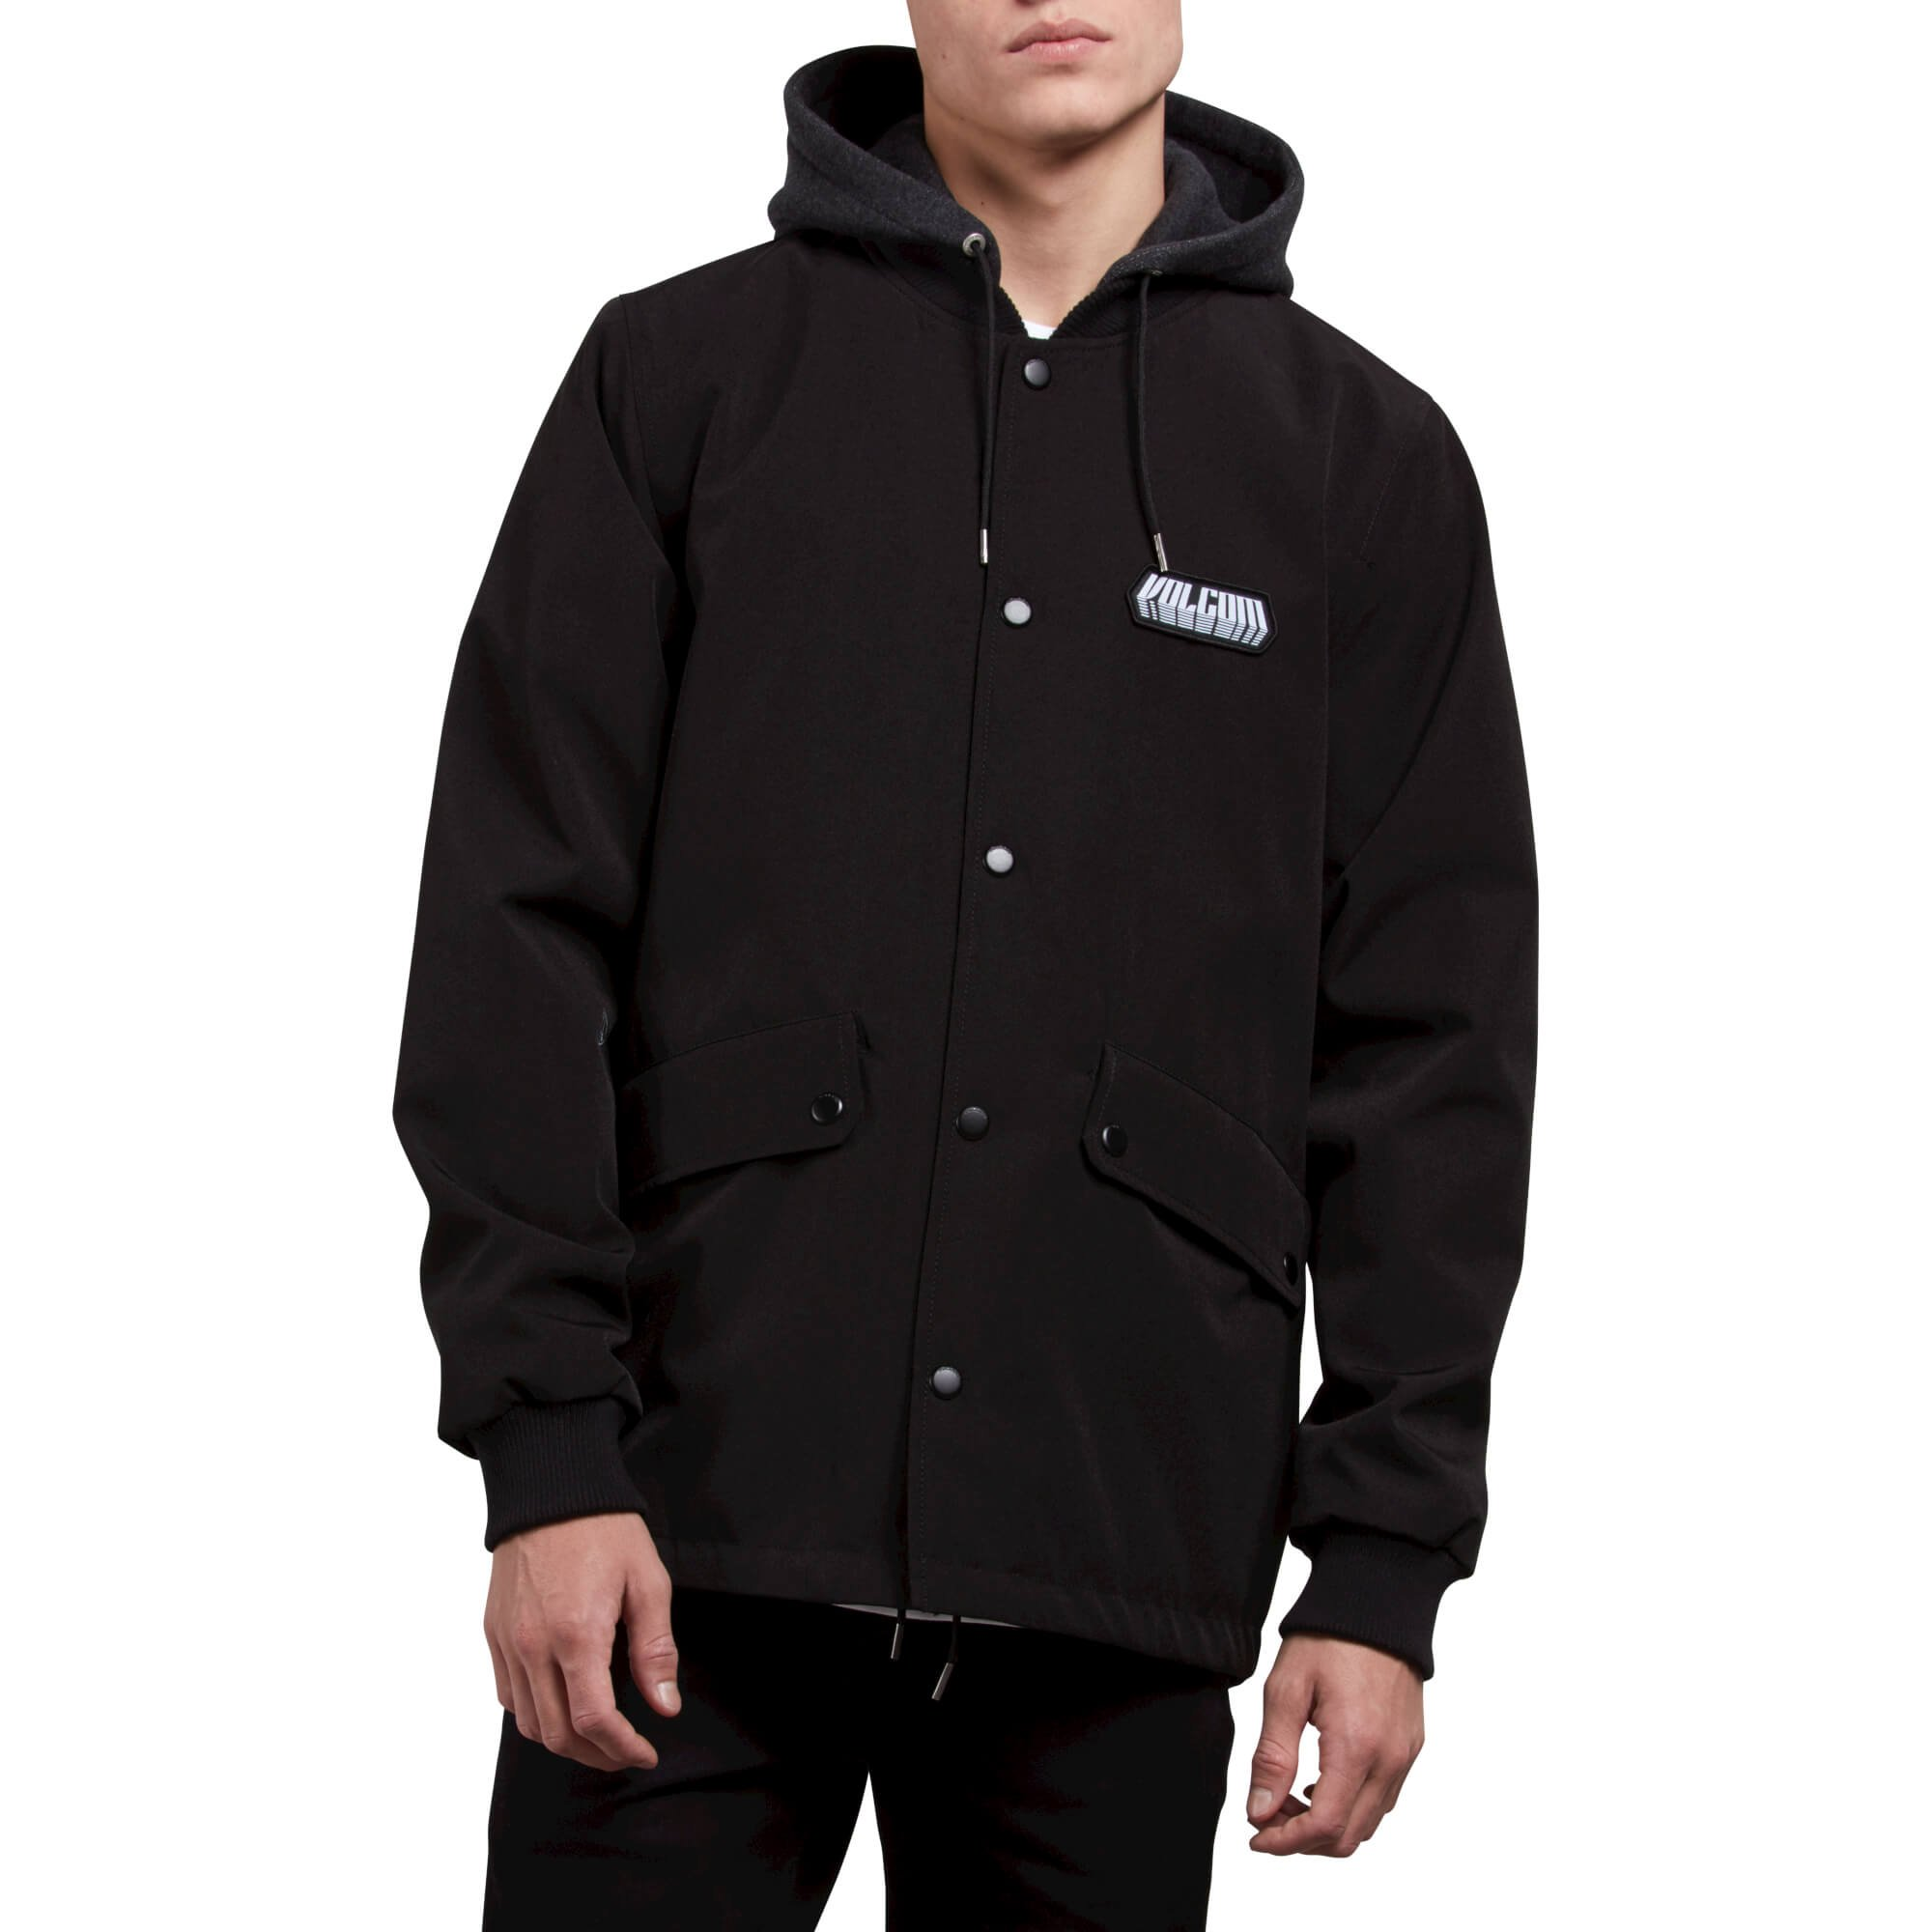 Volcom Men's Highstone Fleece Hooded Weight Coach Jacket, Black, Medium